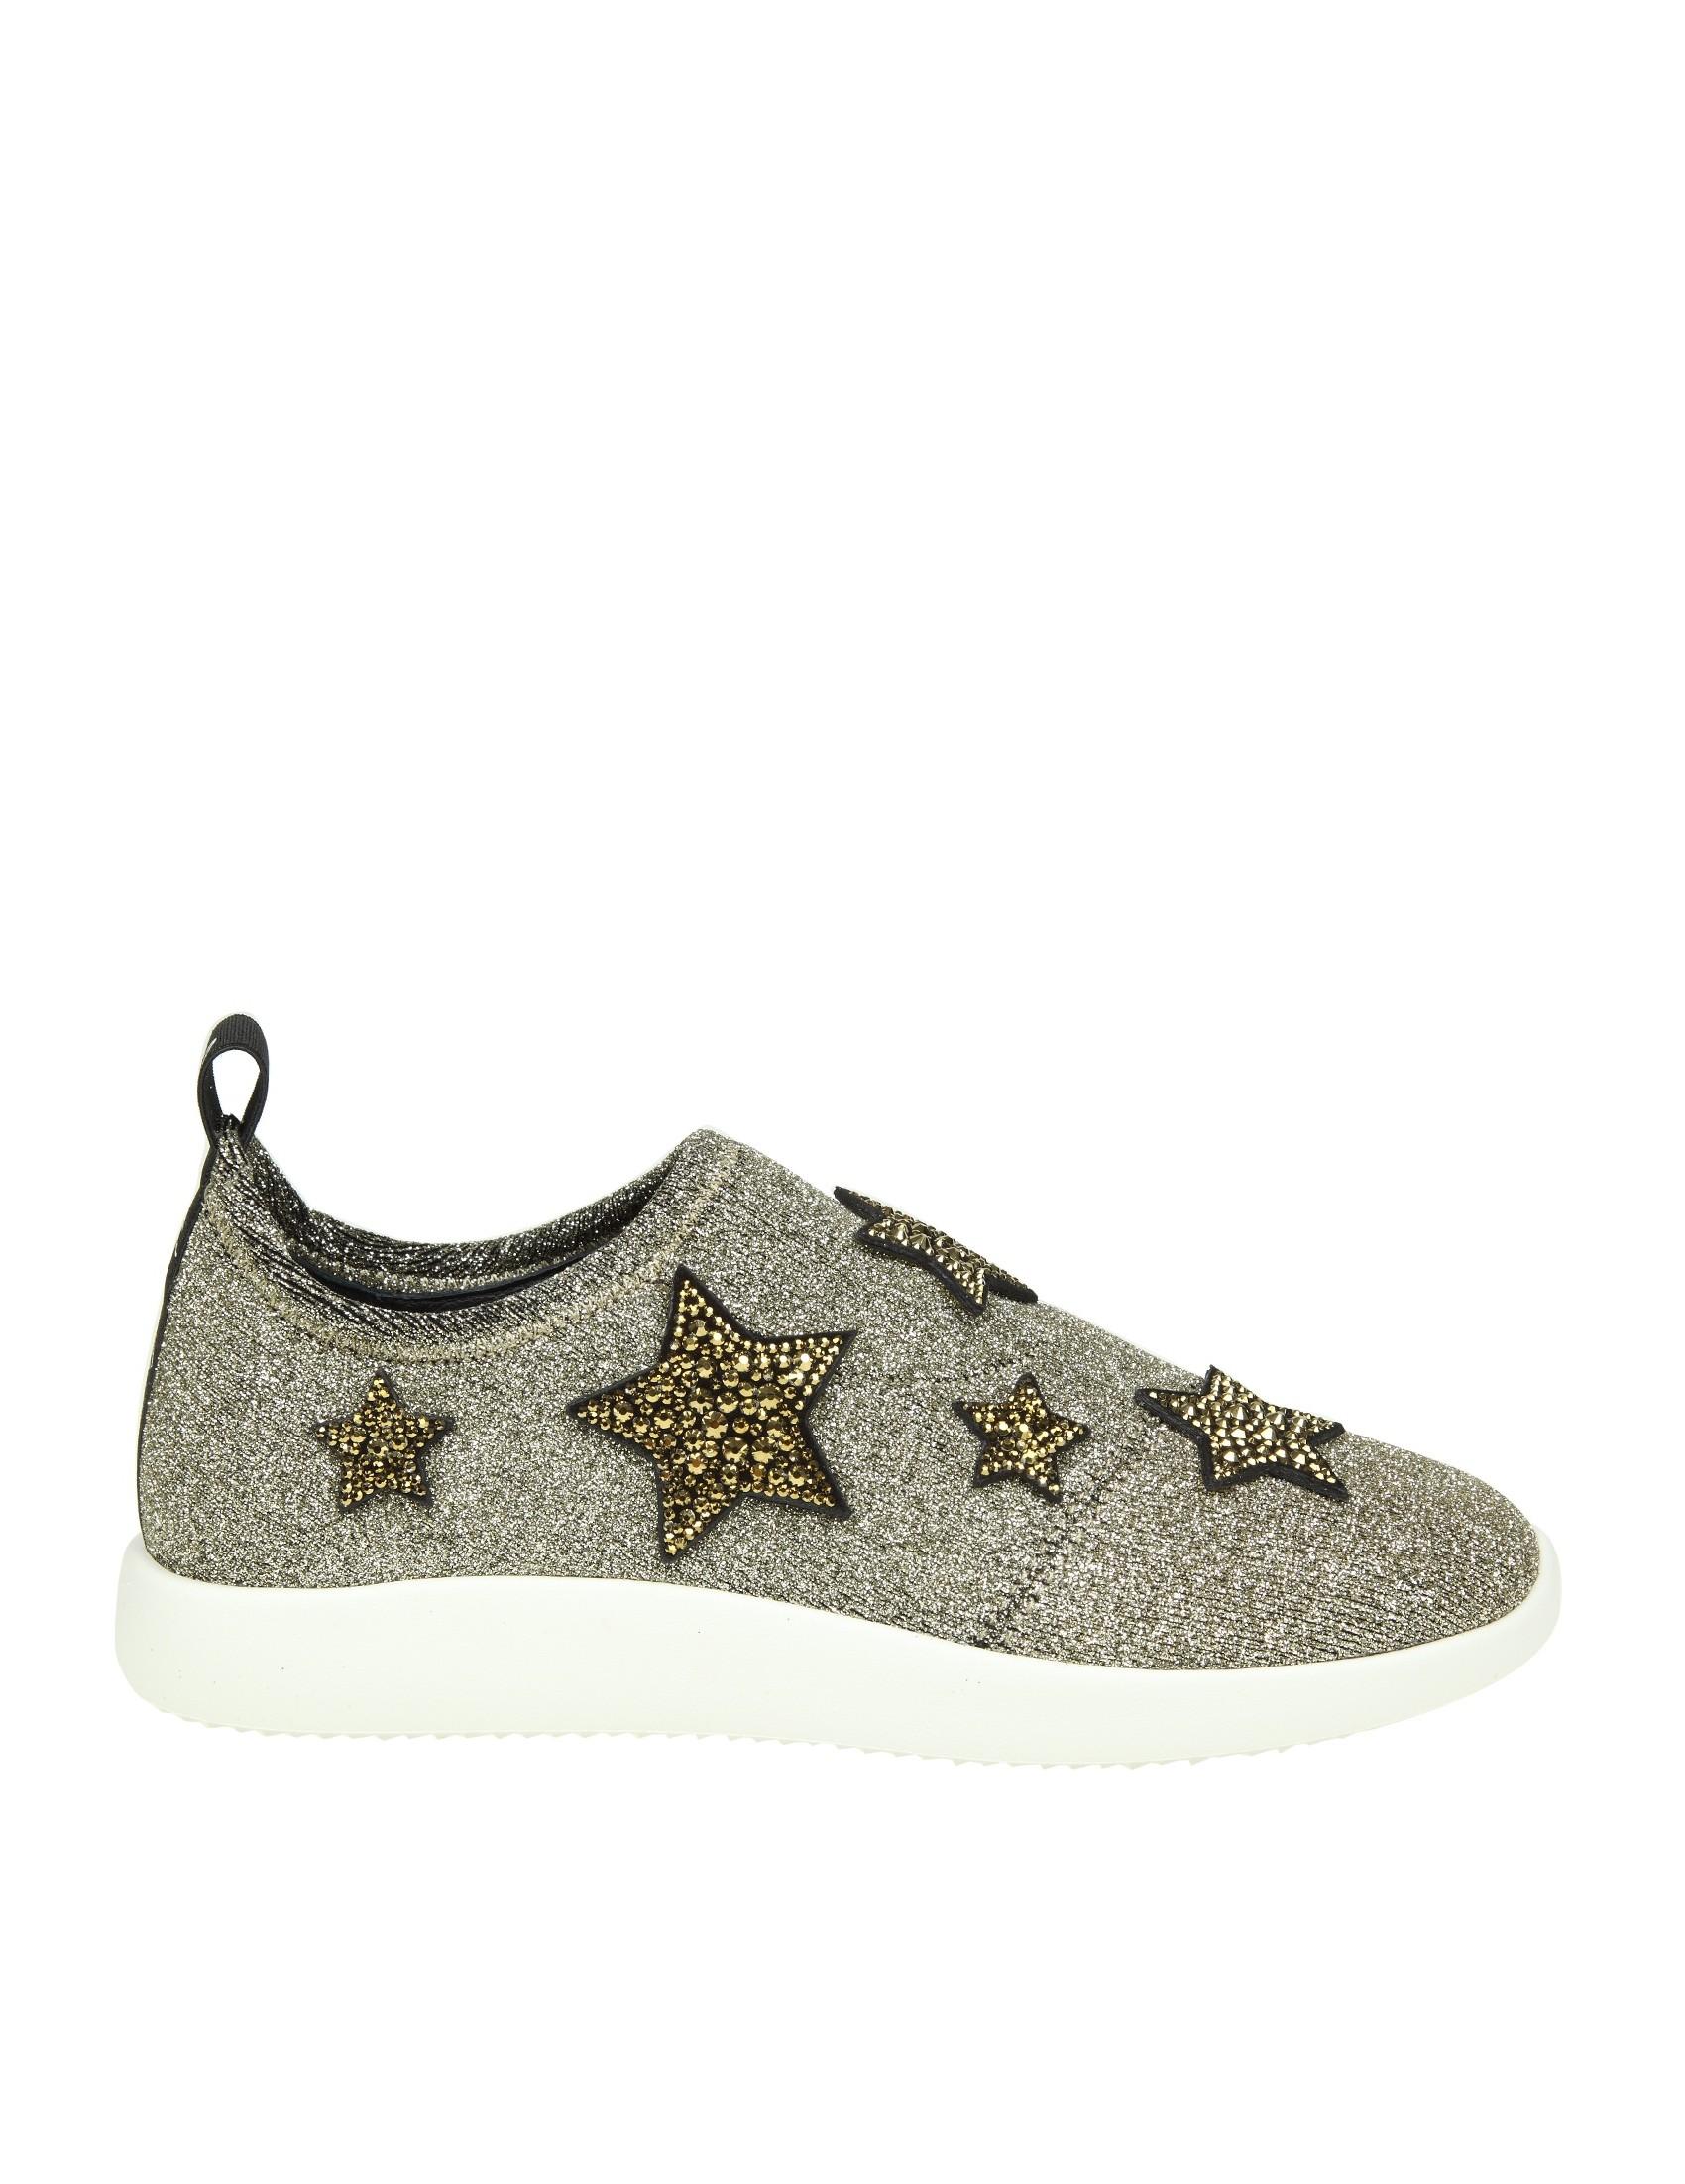 Giuseppe Zanotti Fabric slip on sneaker with stars ALENA STAR wcbvGIiyf